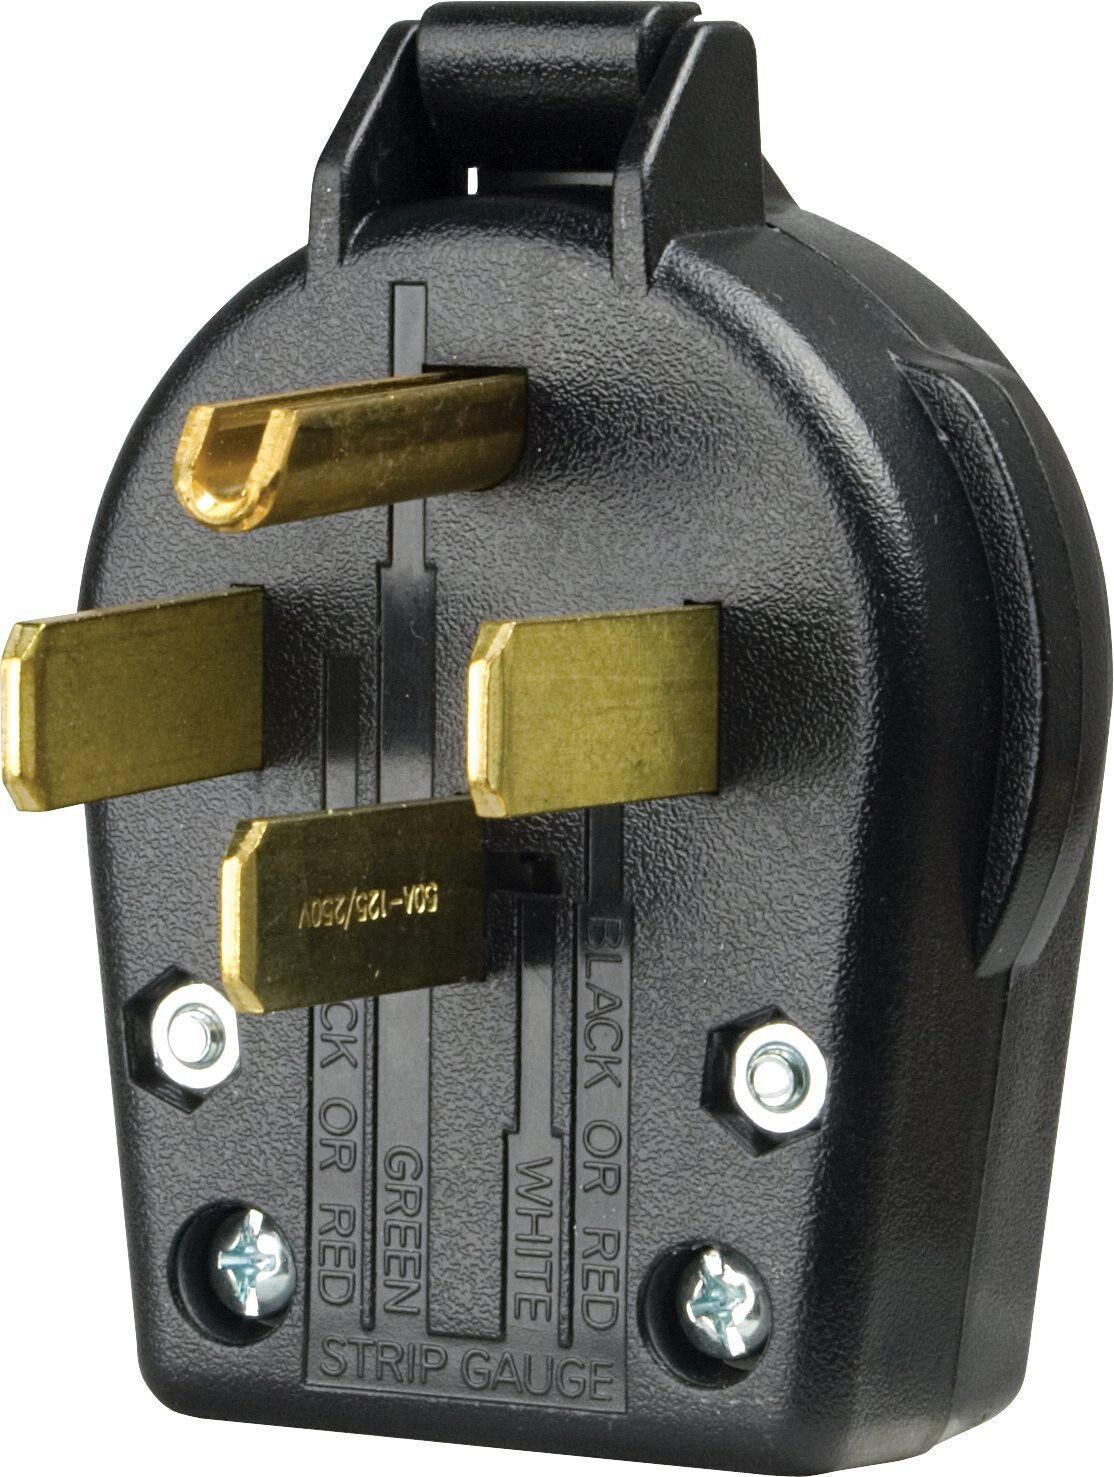 hight resolution of cooper wiring devices s 21 sp l dryer angles plug 30 amp 125 250 volt black for sale online ebay